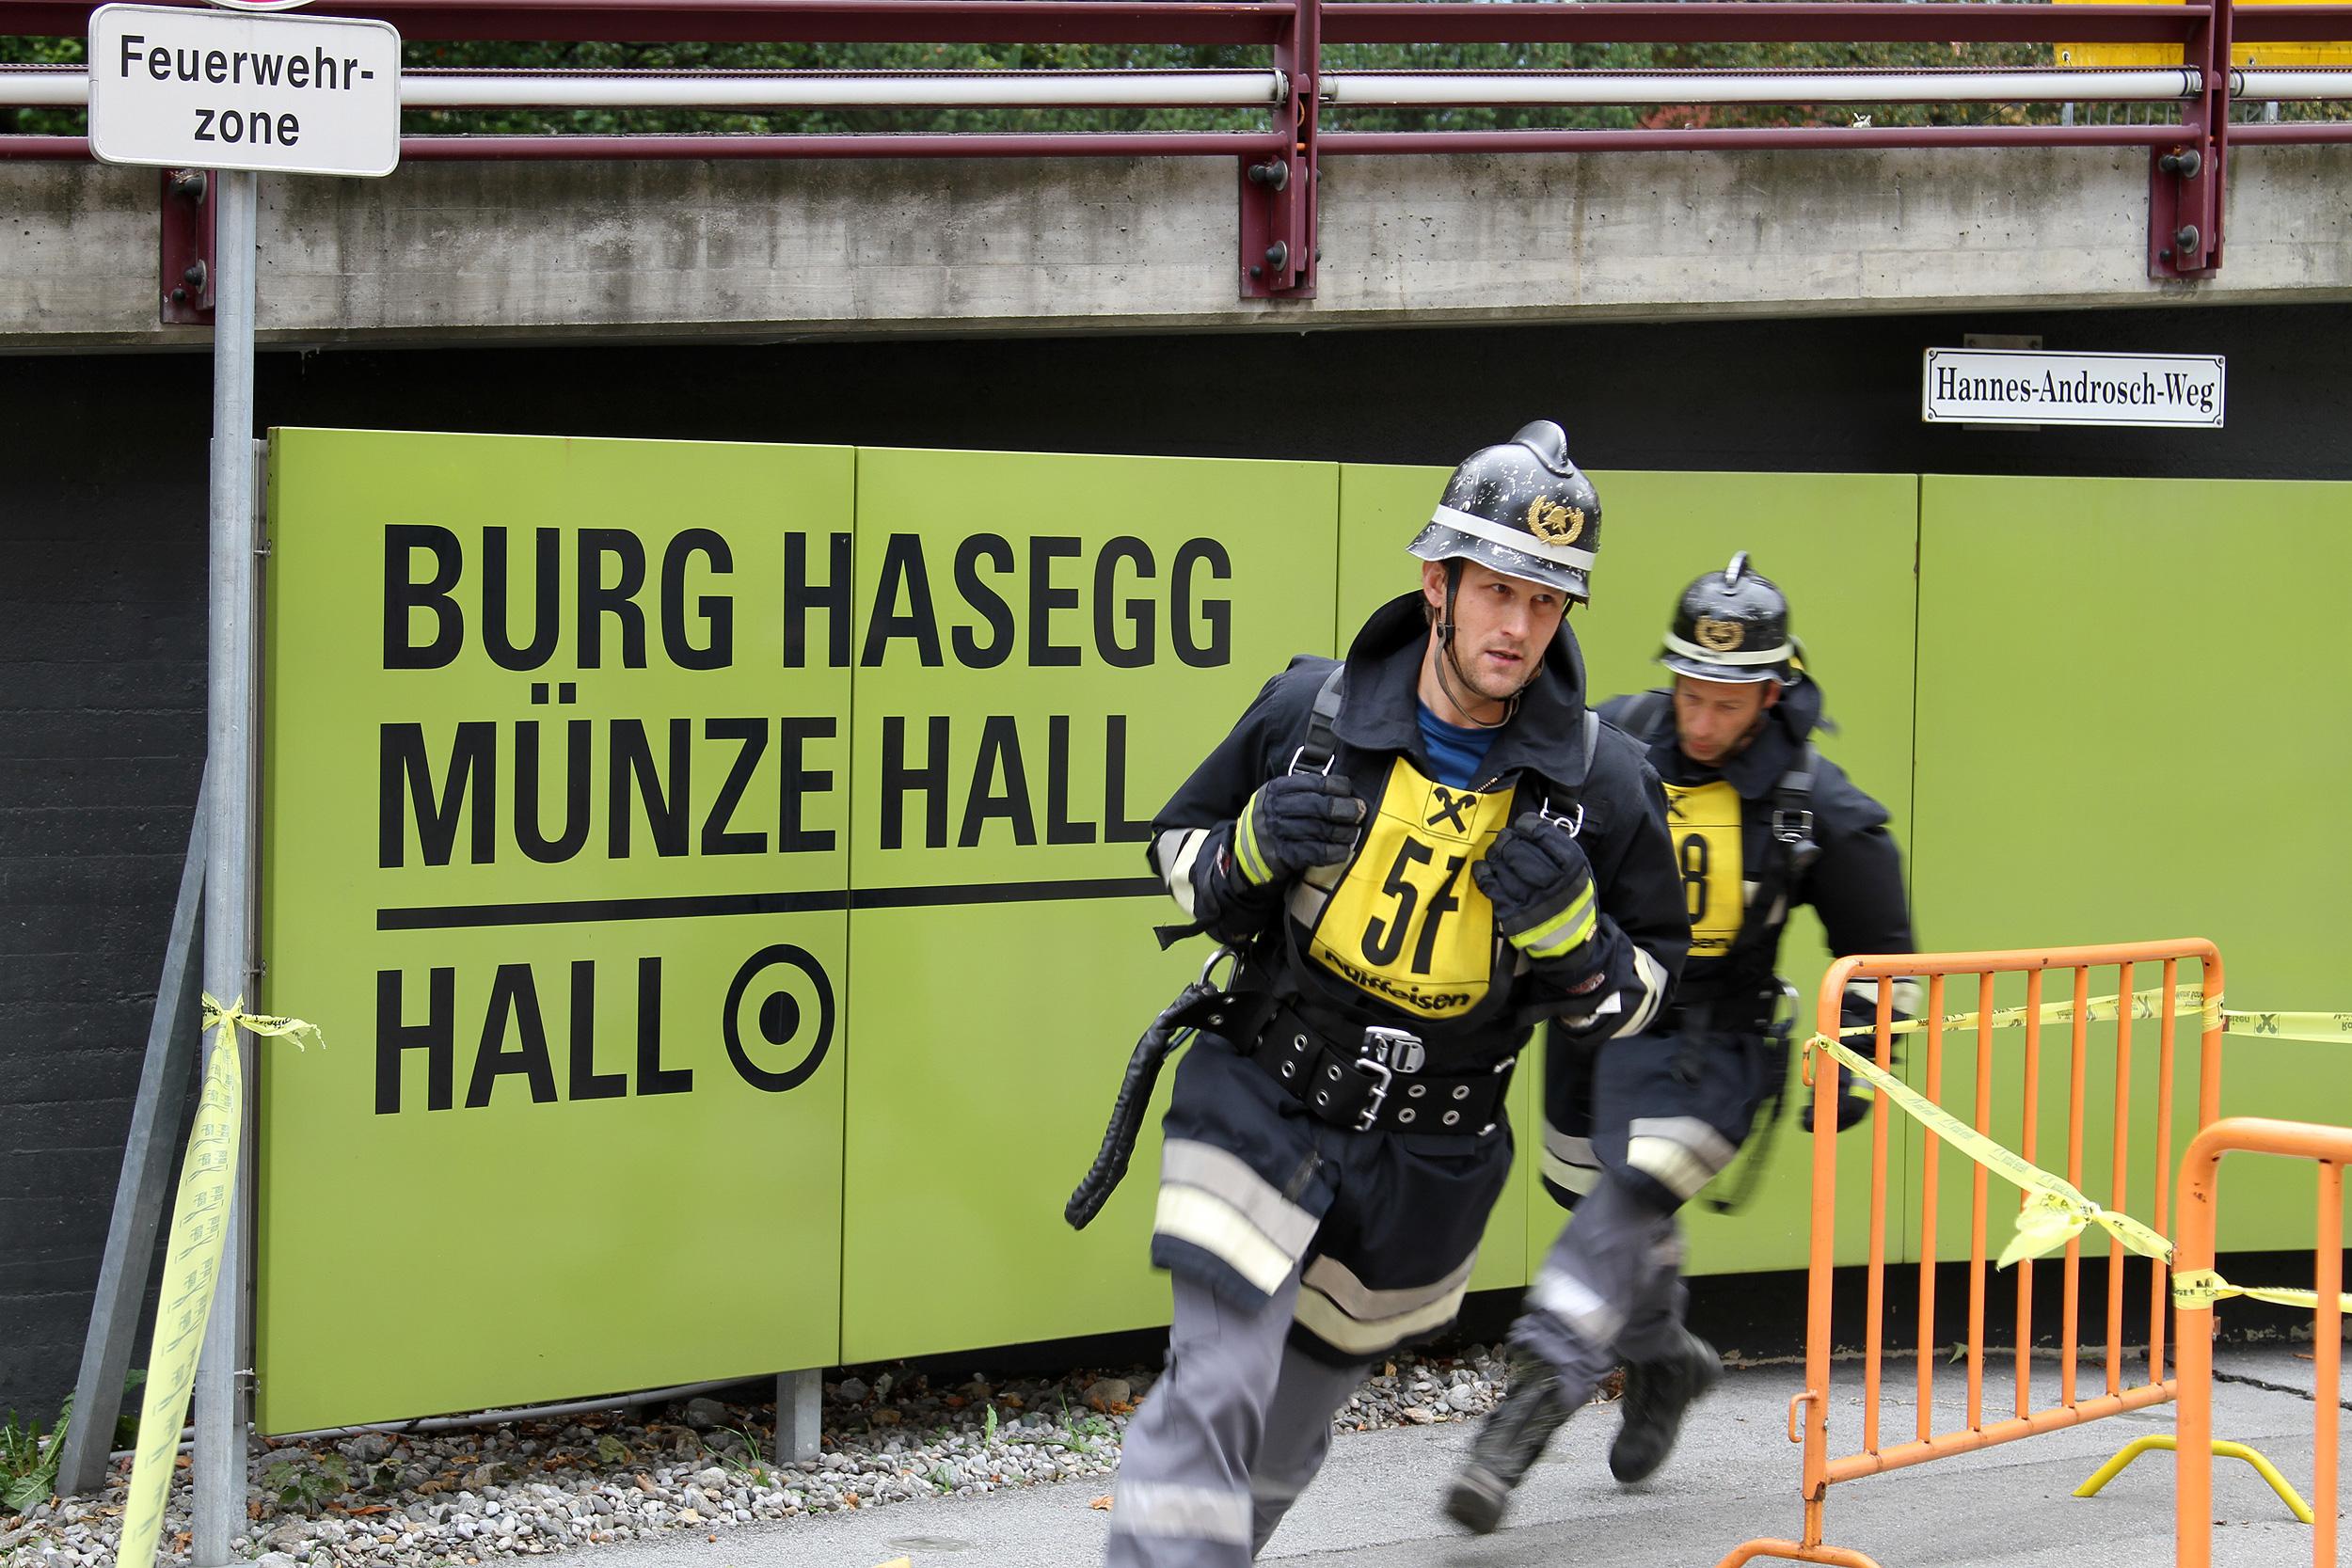 Turmlauf_Foto-Gerhard-Flatscher_www.your-fotos.com_IMG_4379